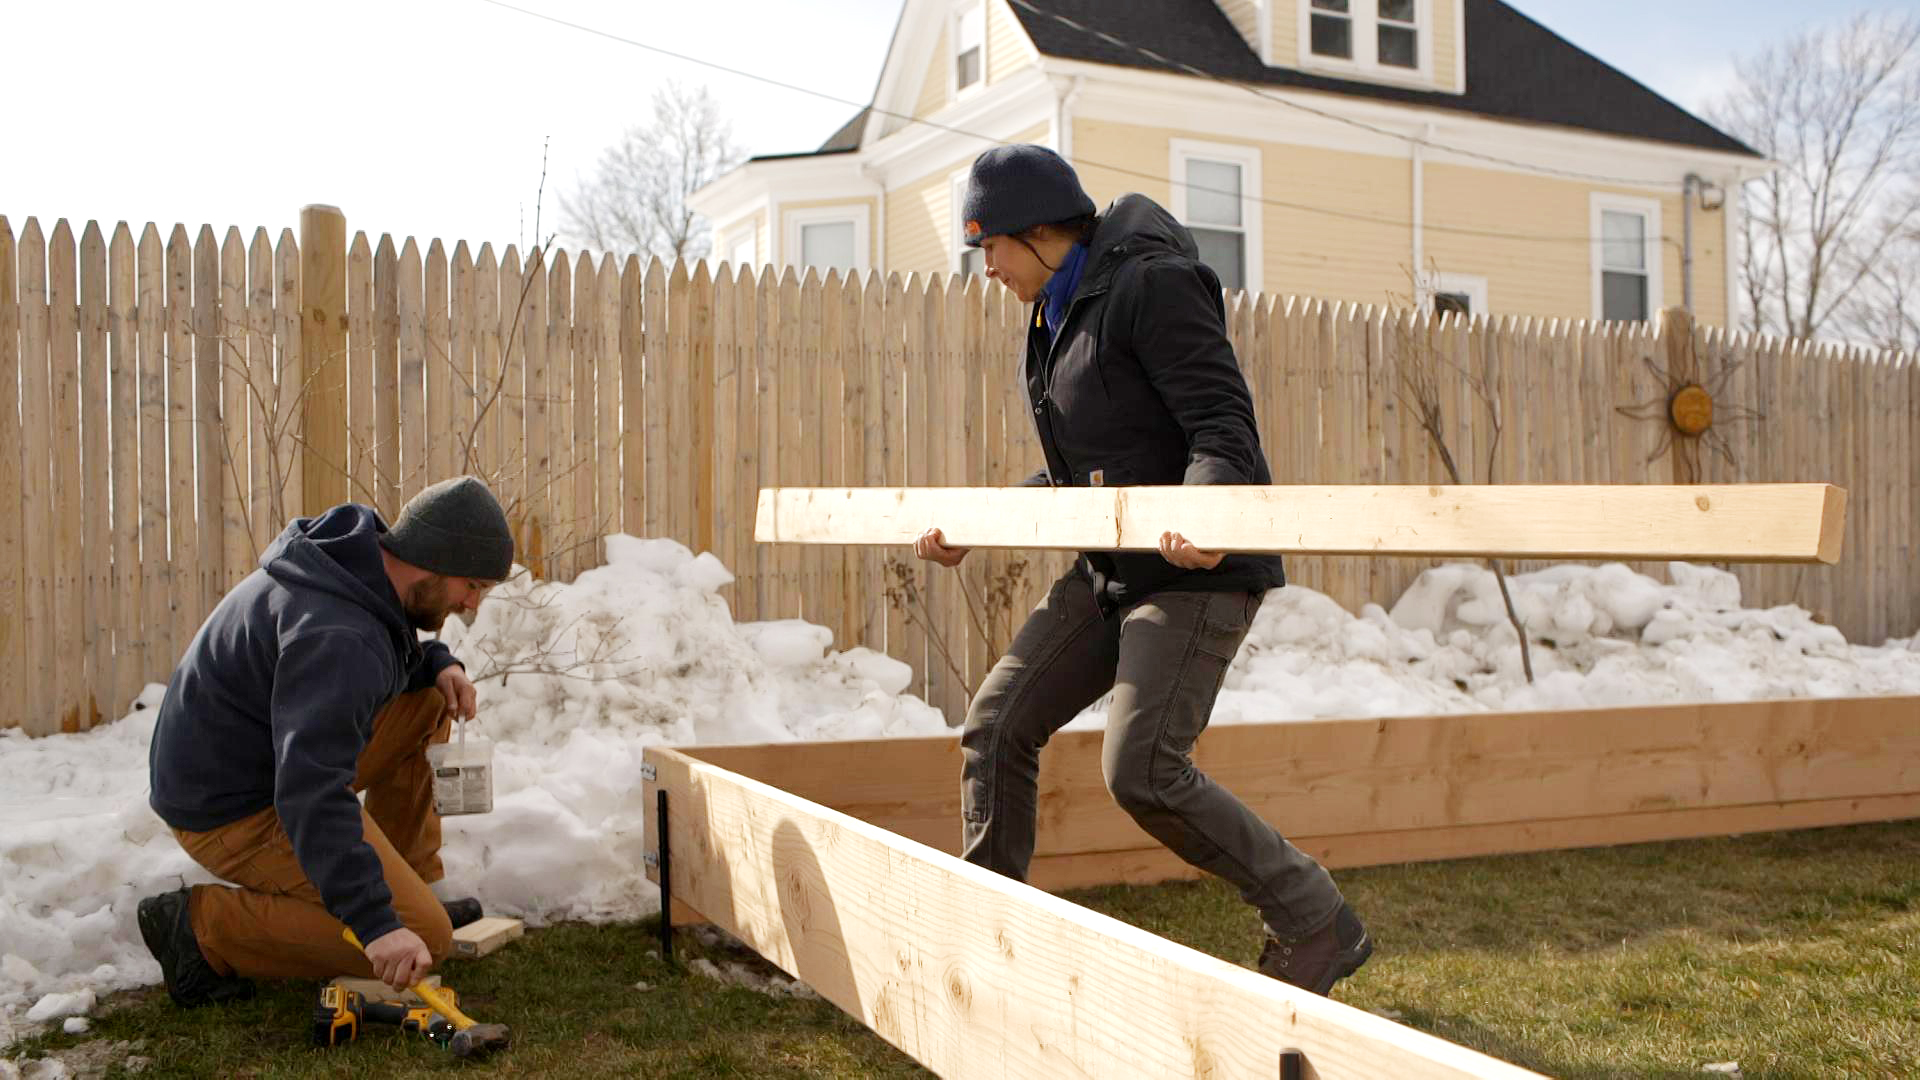 S20 E4, Nathan Gilbert and Jenn Nawada build a backyard ice rink